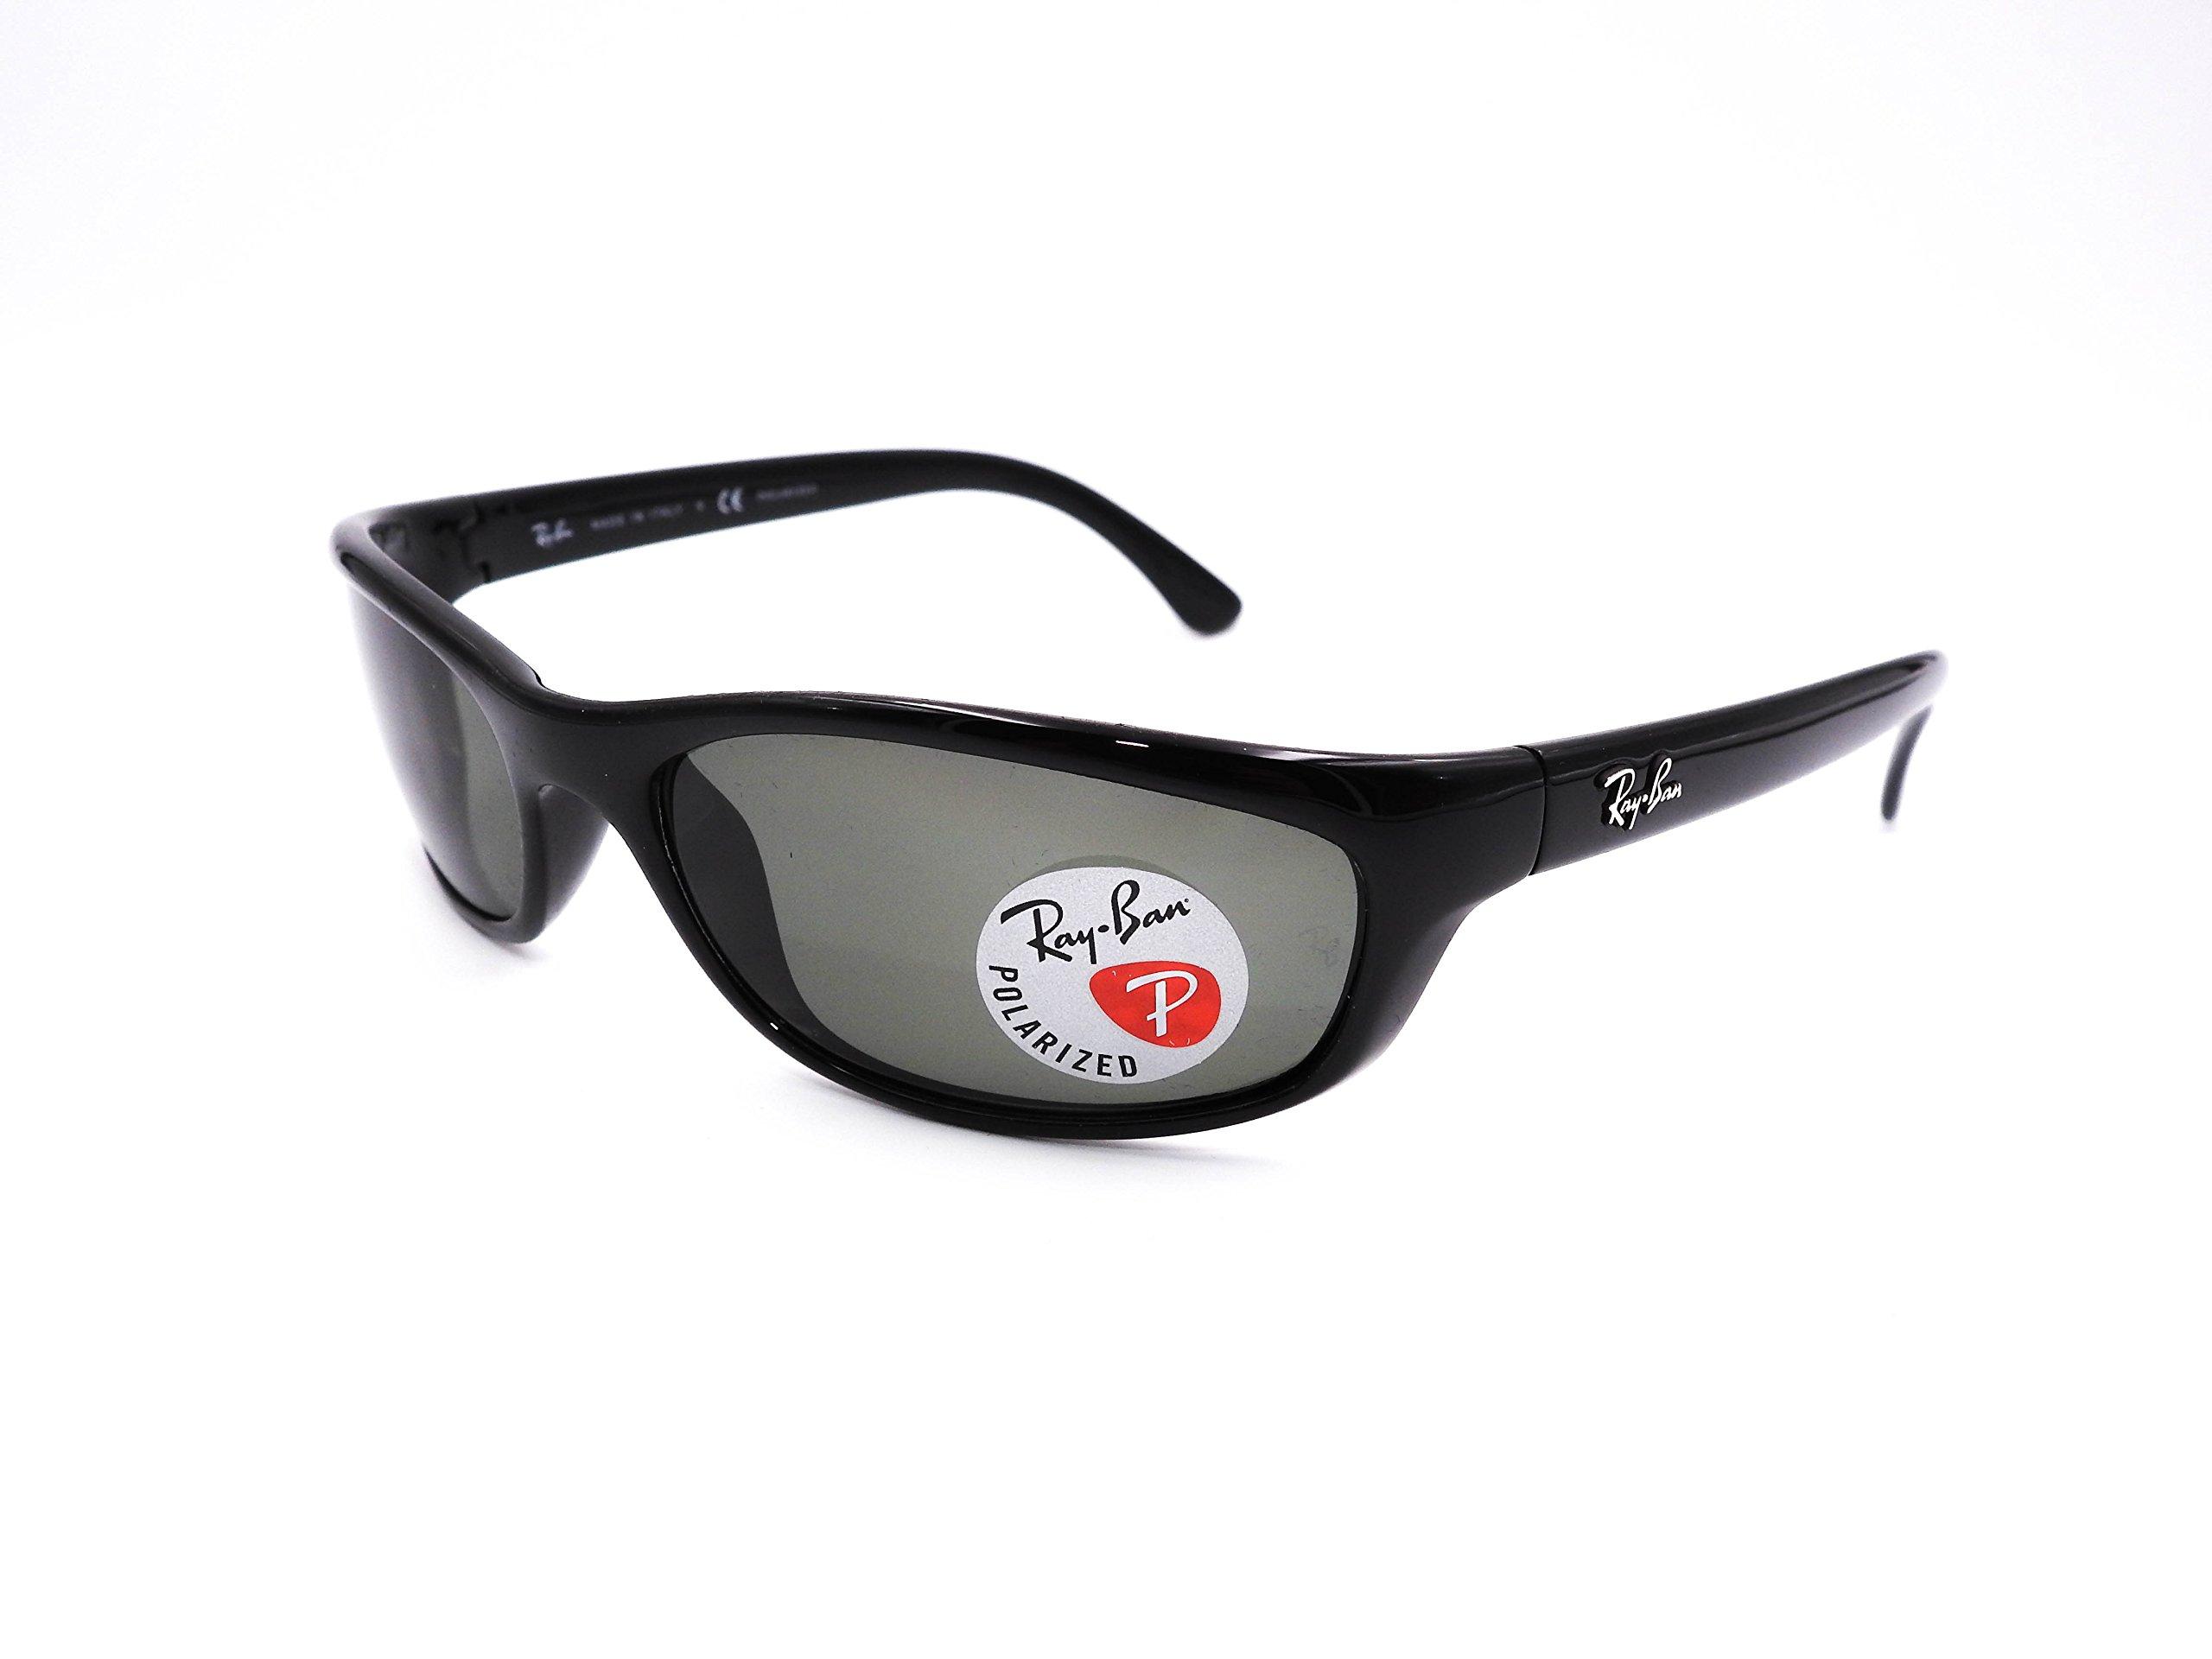 Ray-Ban RB4115 - 601/9A Polarized Sunglasses